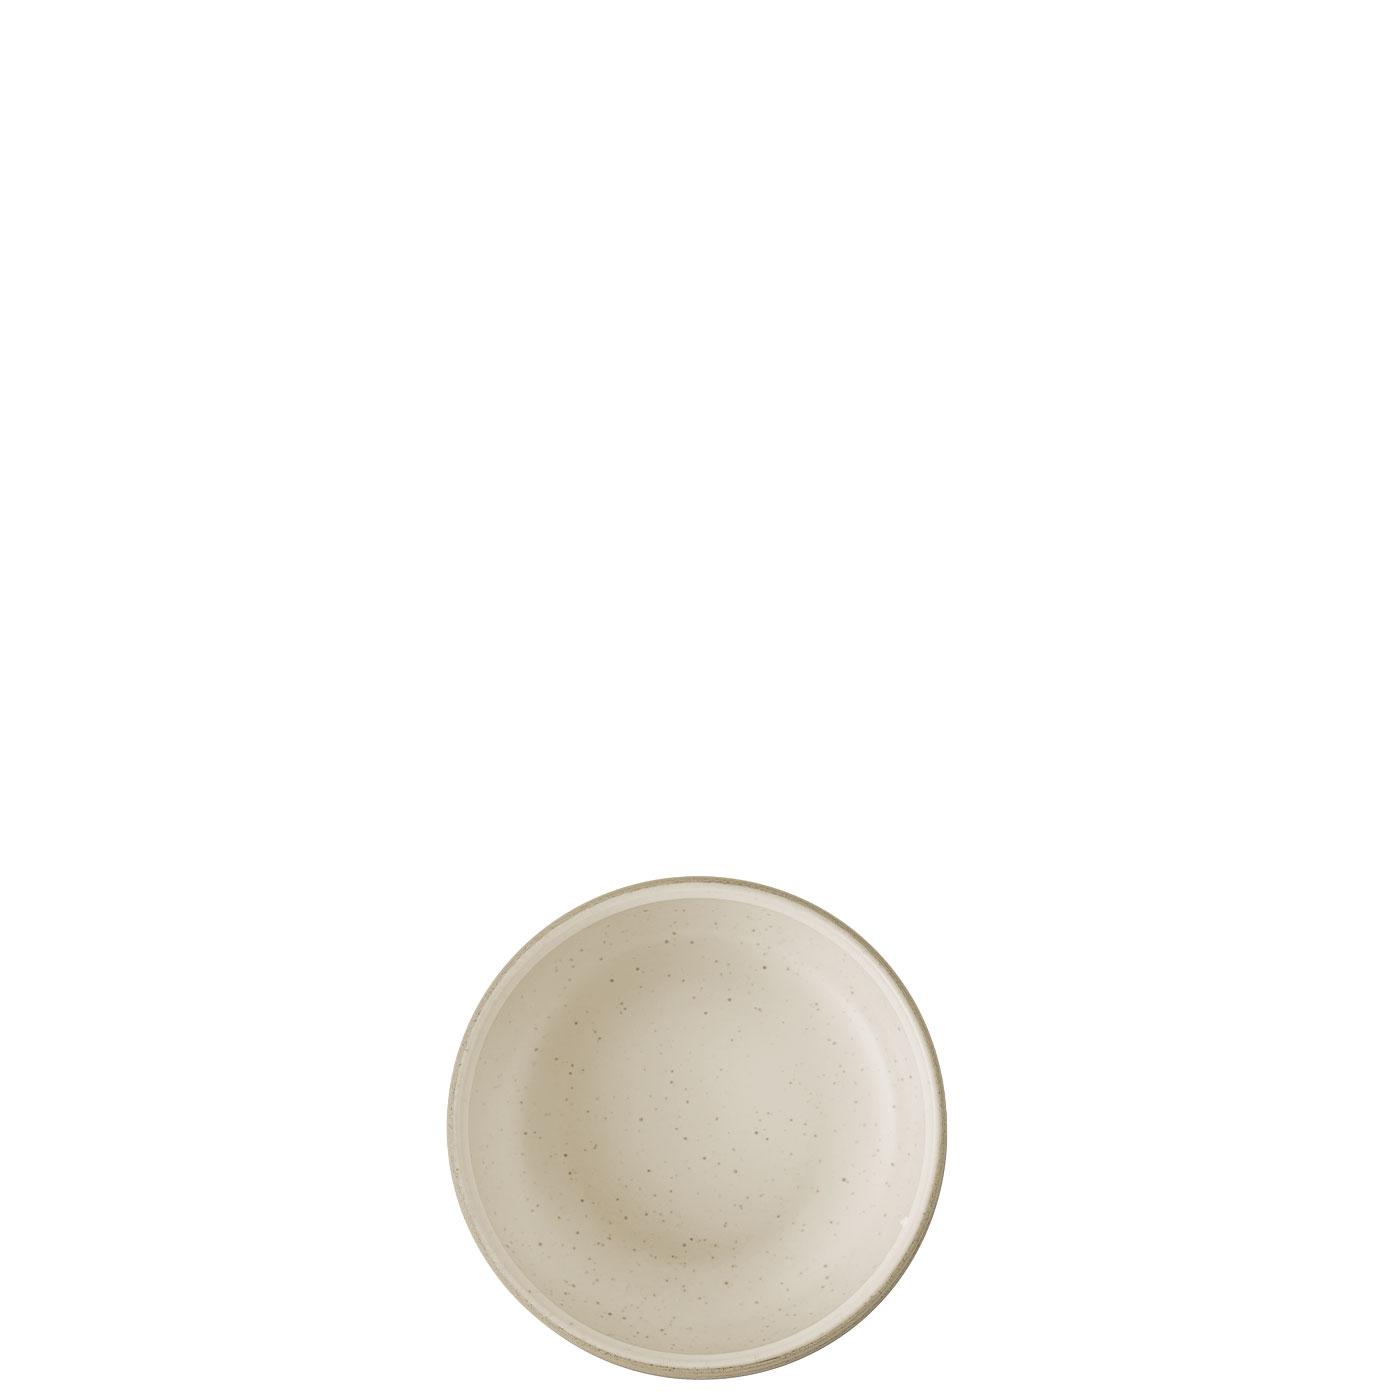 Bowl 12 cm Joyn Stoneware Ash Arzberg